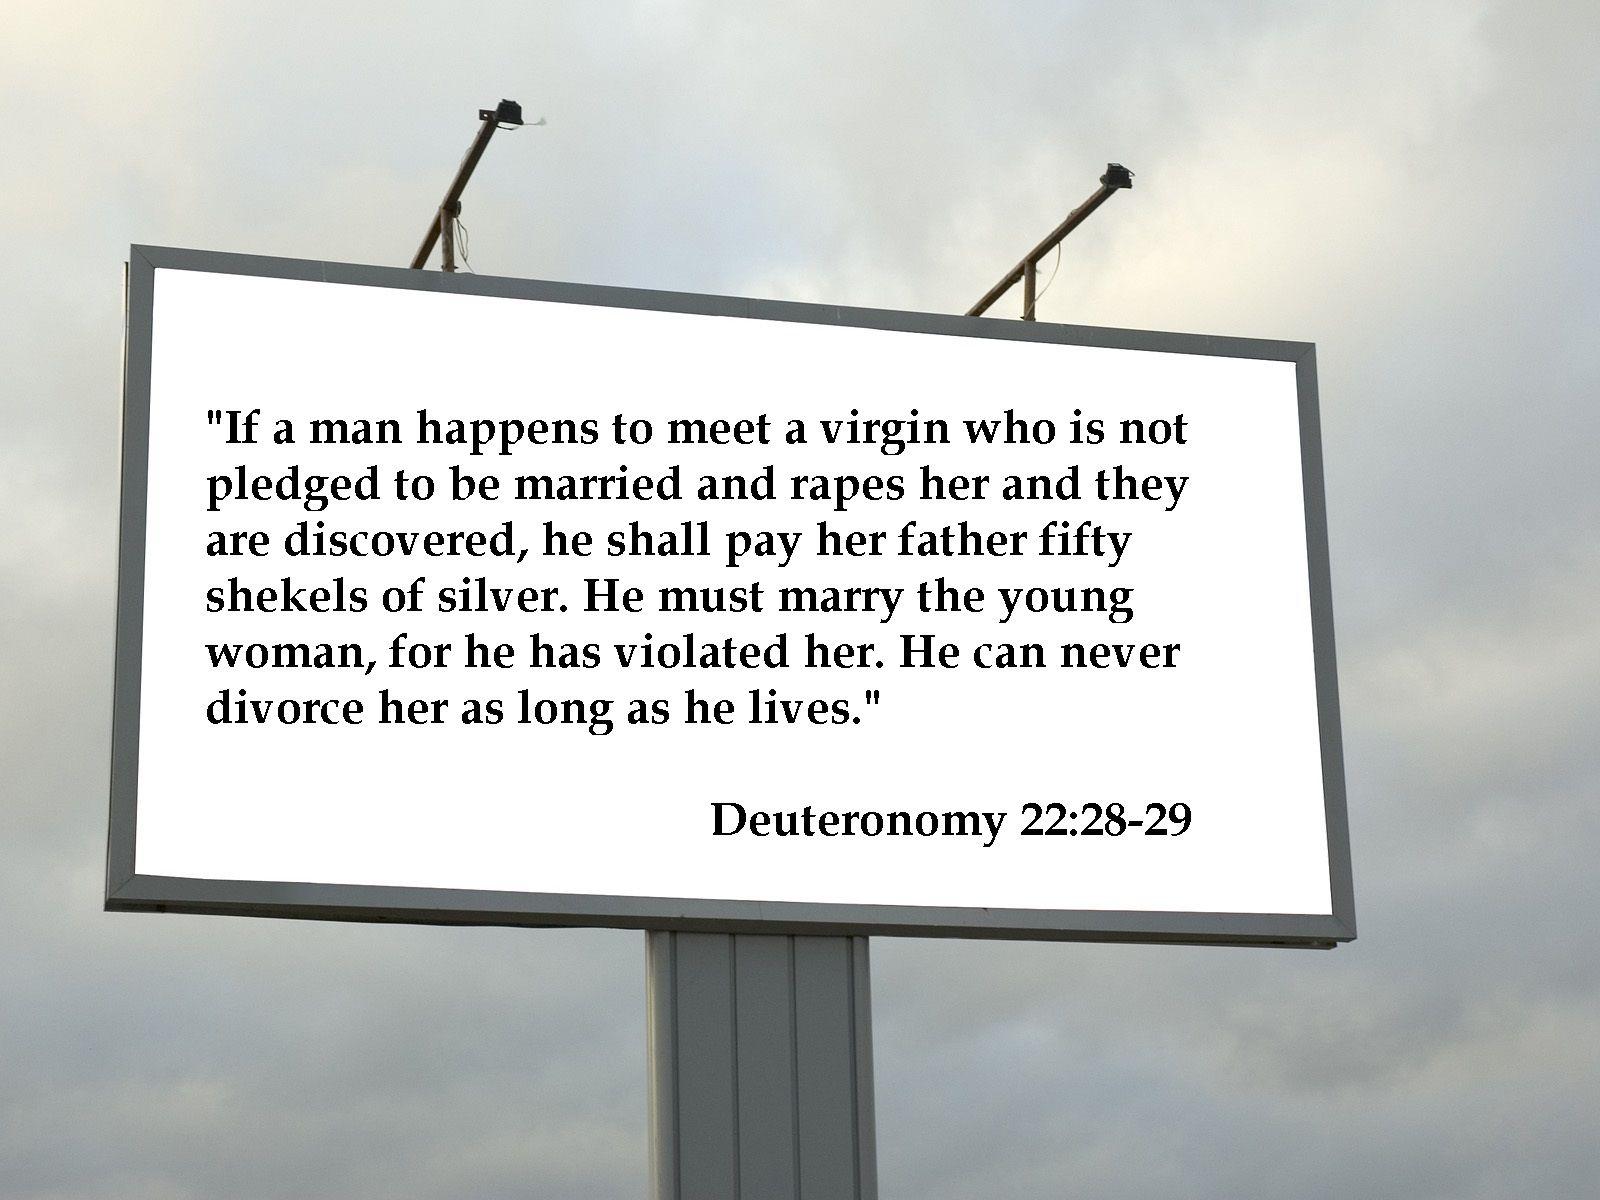 Christian billboards I wish Atheists would make #16